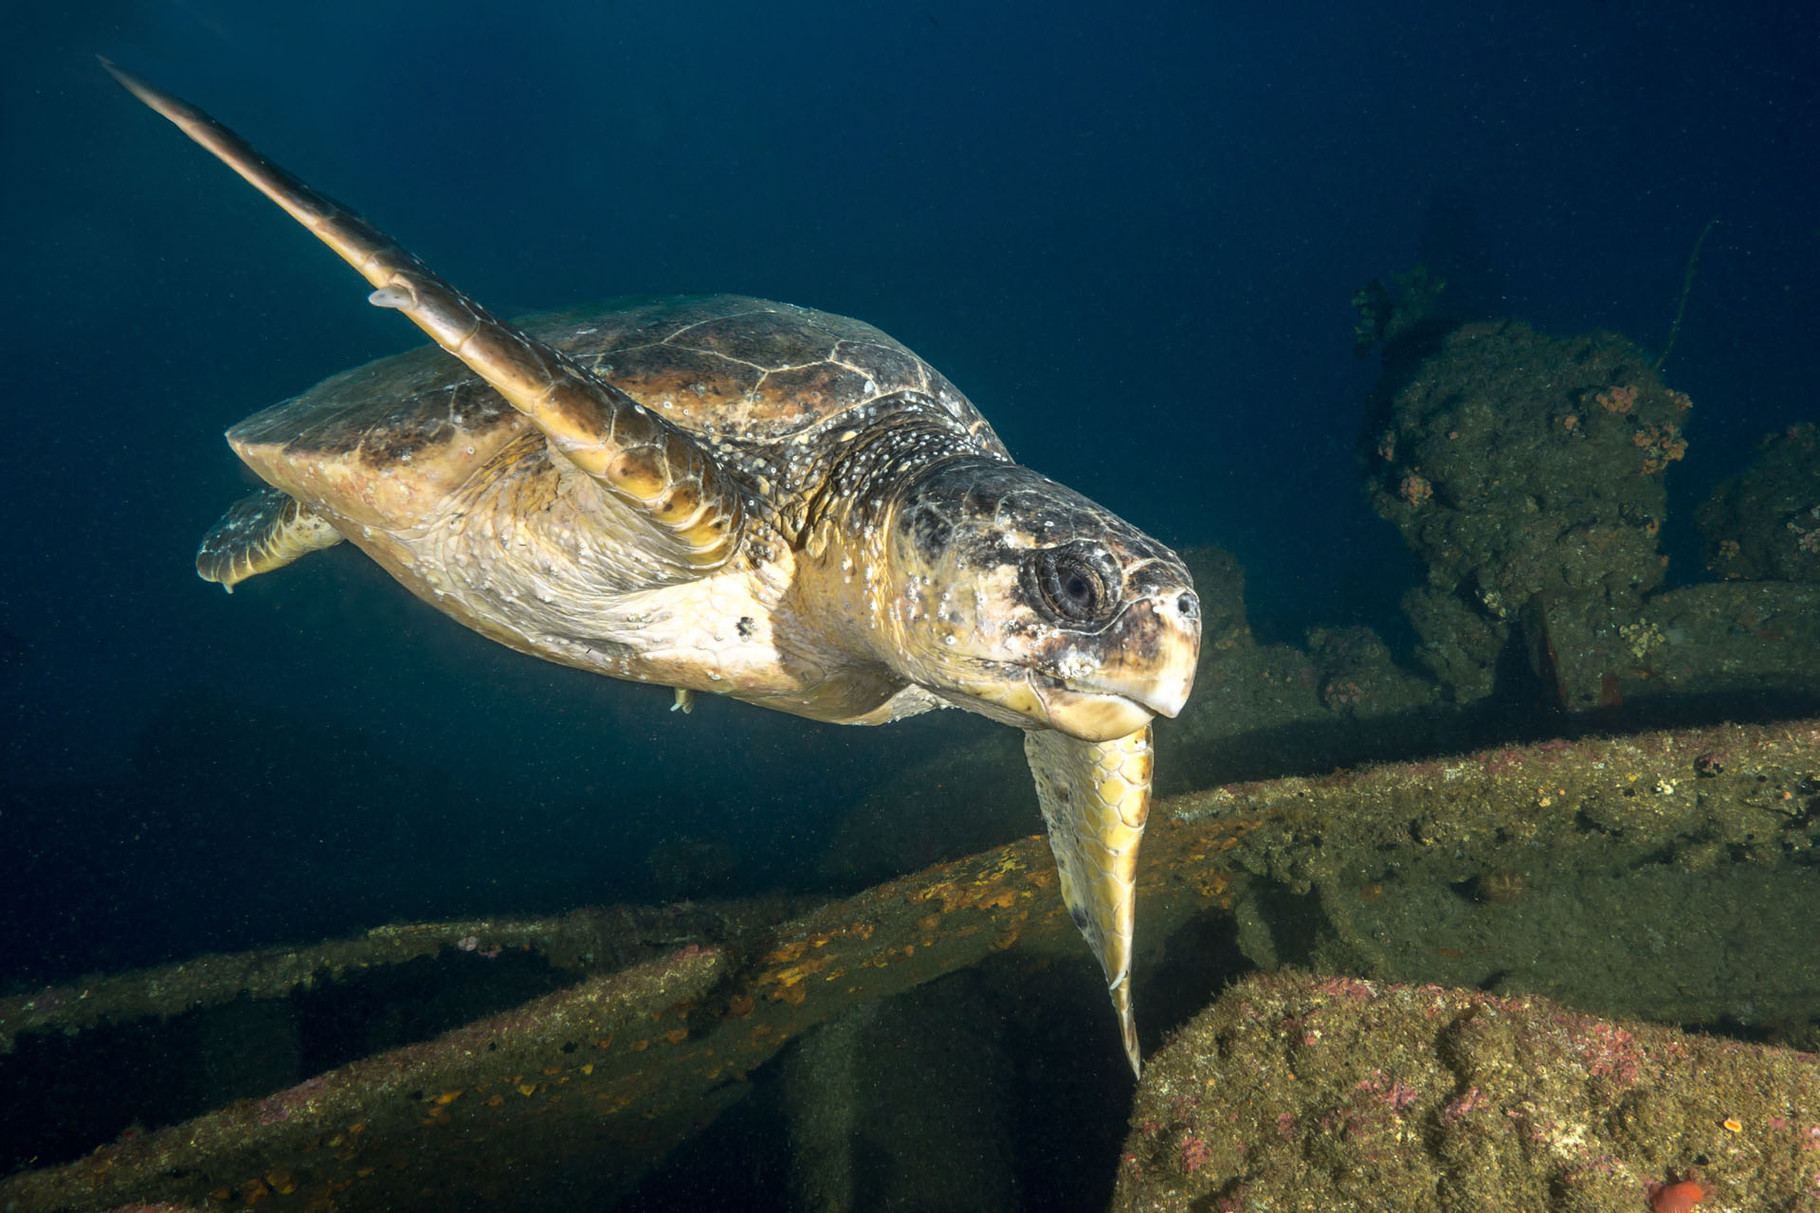 Turtle, Aliwal shoal [South Africa, 2015]